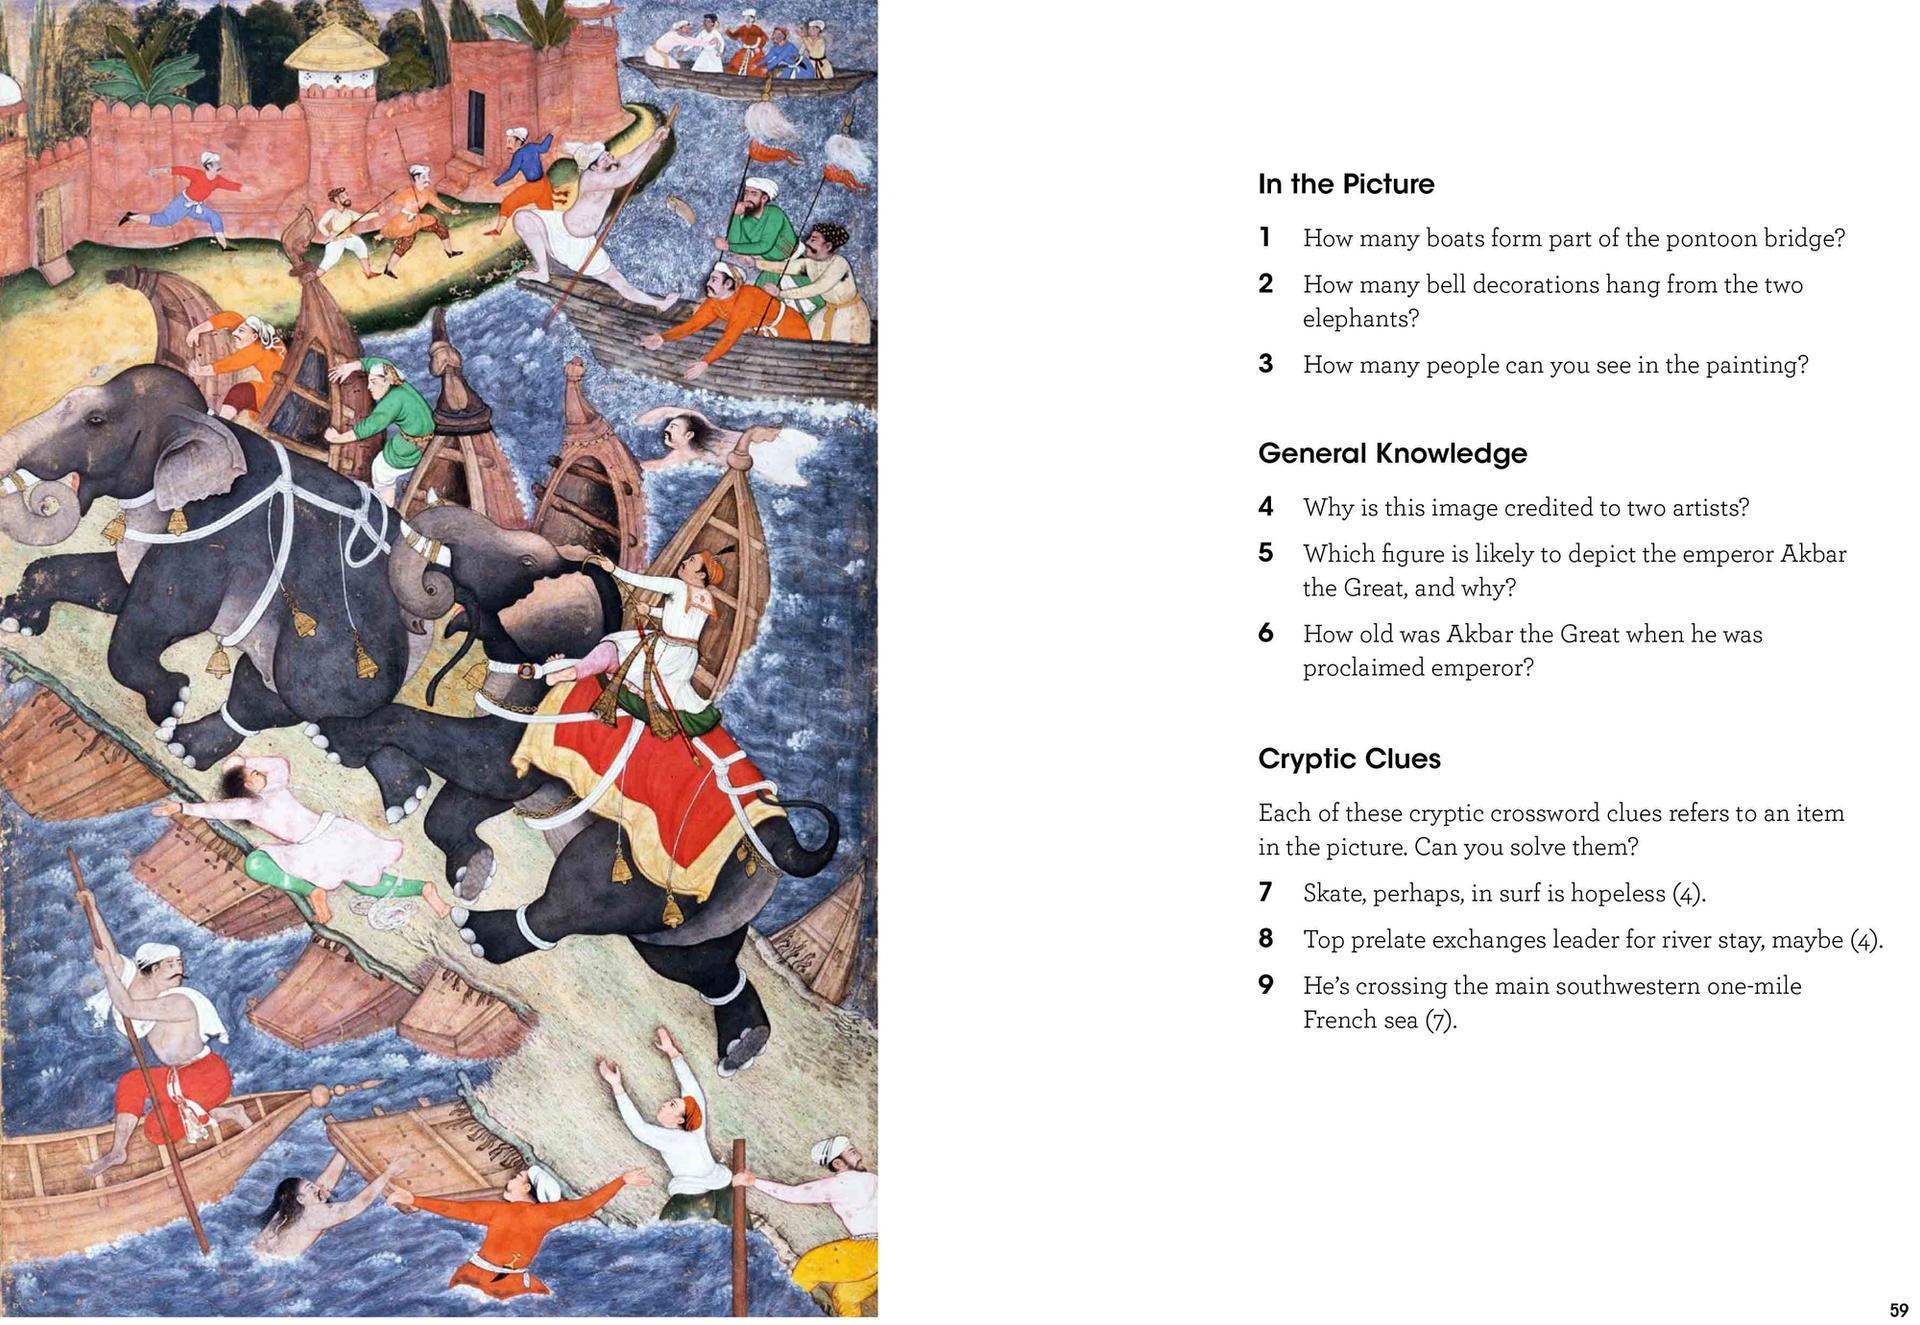 Basawan and Chetar Munti, Akbar's Adventures with the Elephant Hawa'i (around 1590-95) Courtesy of the publisher